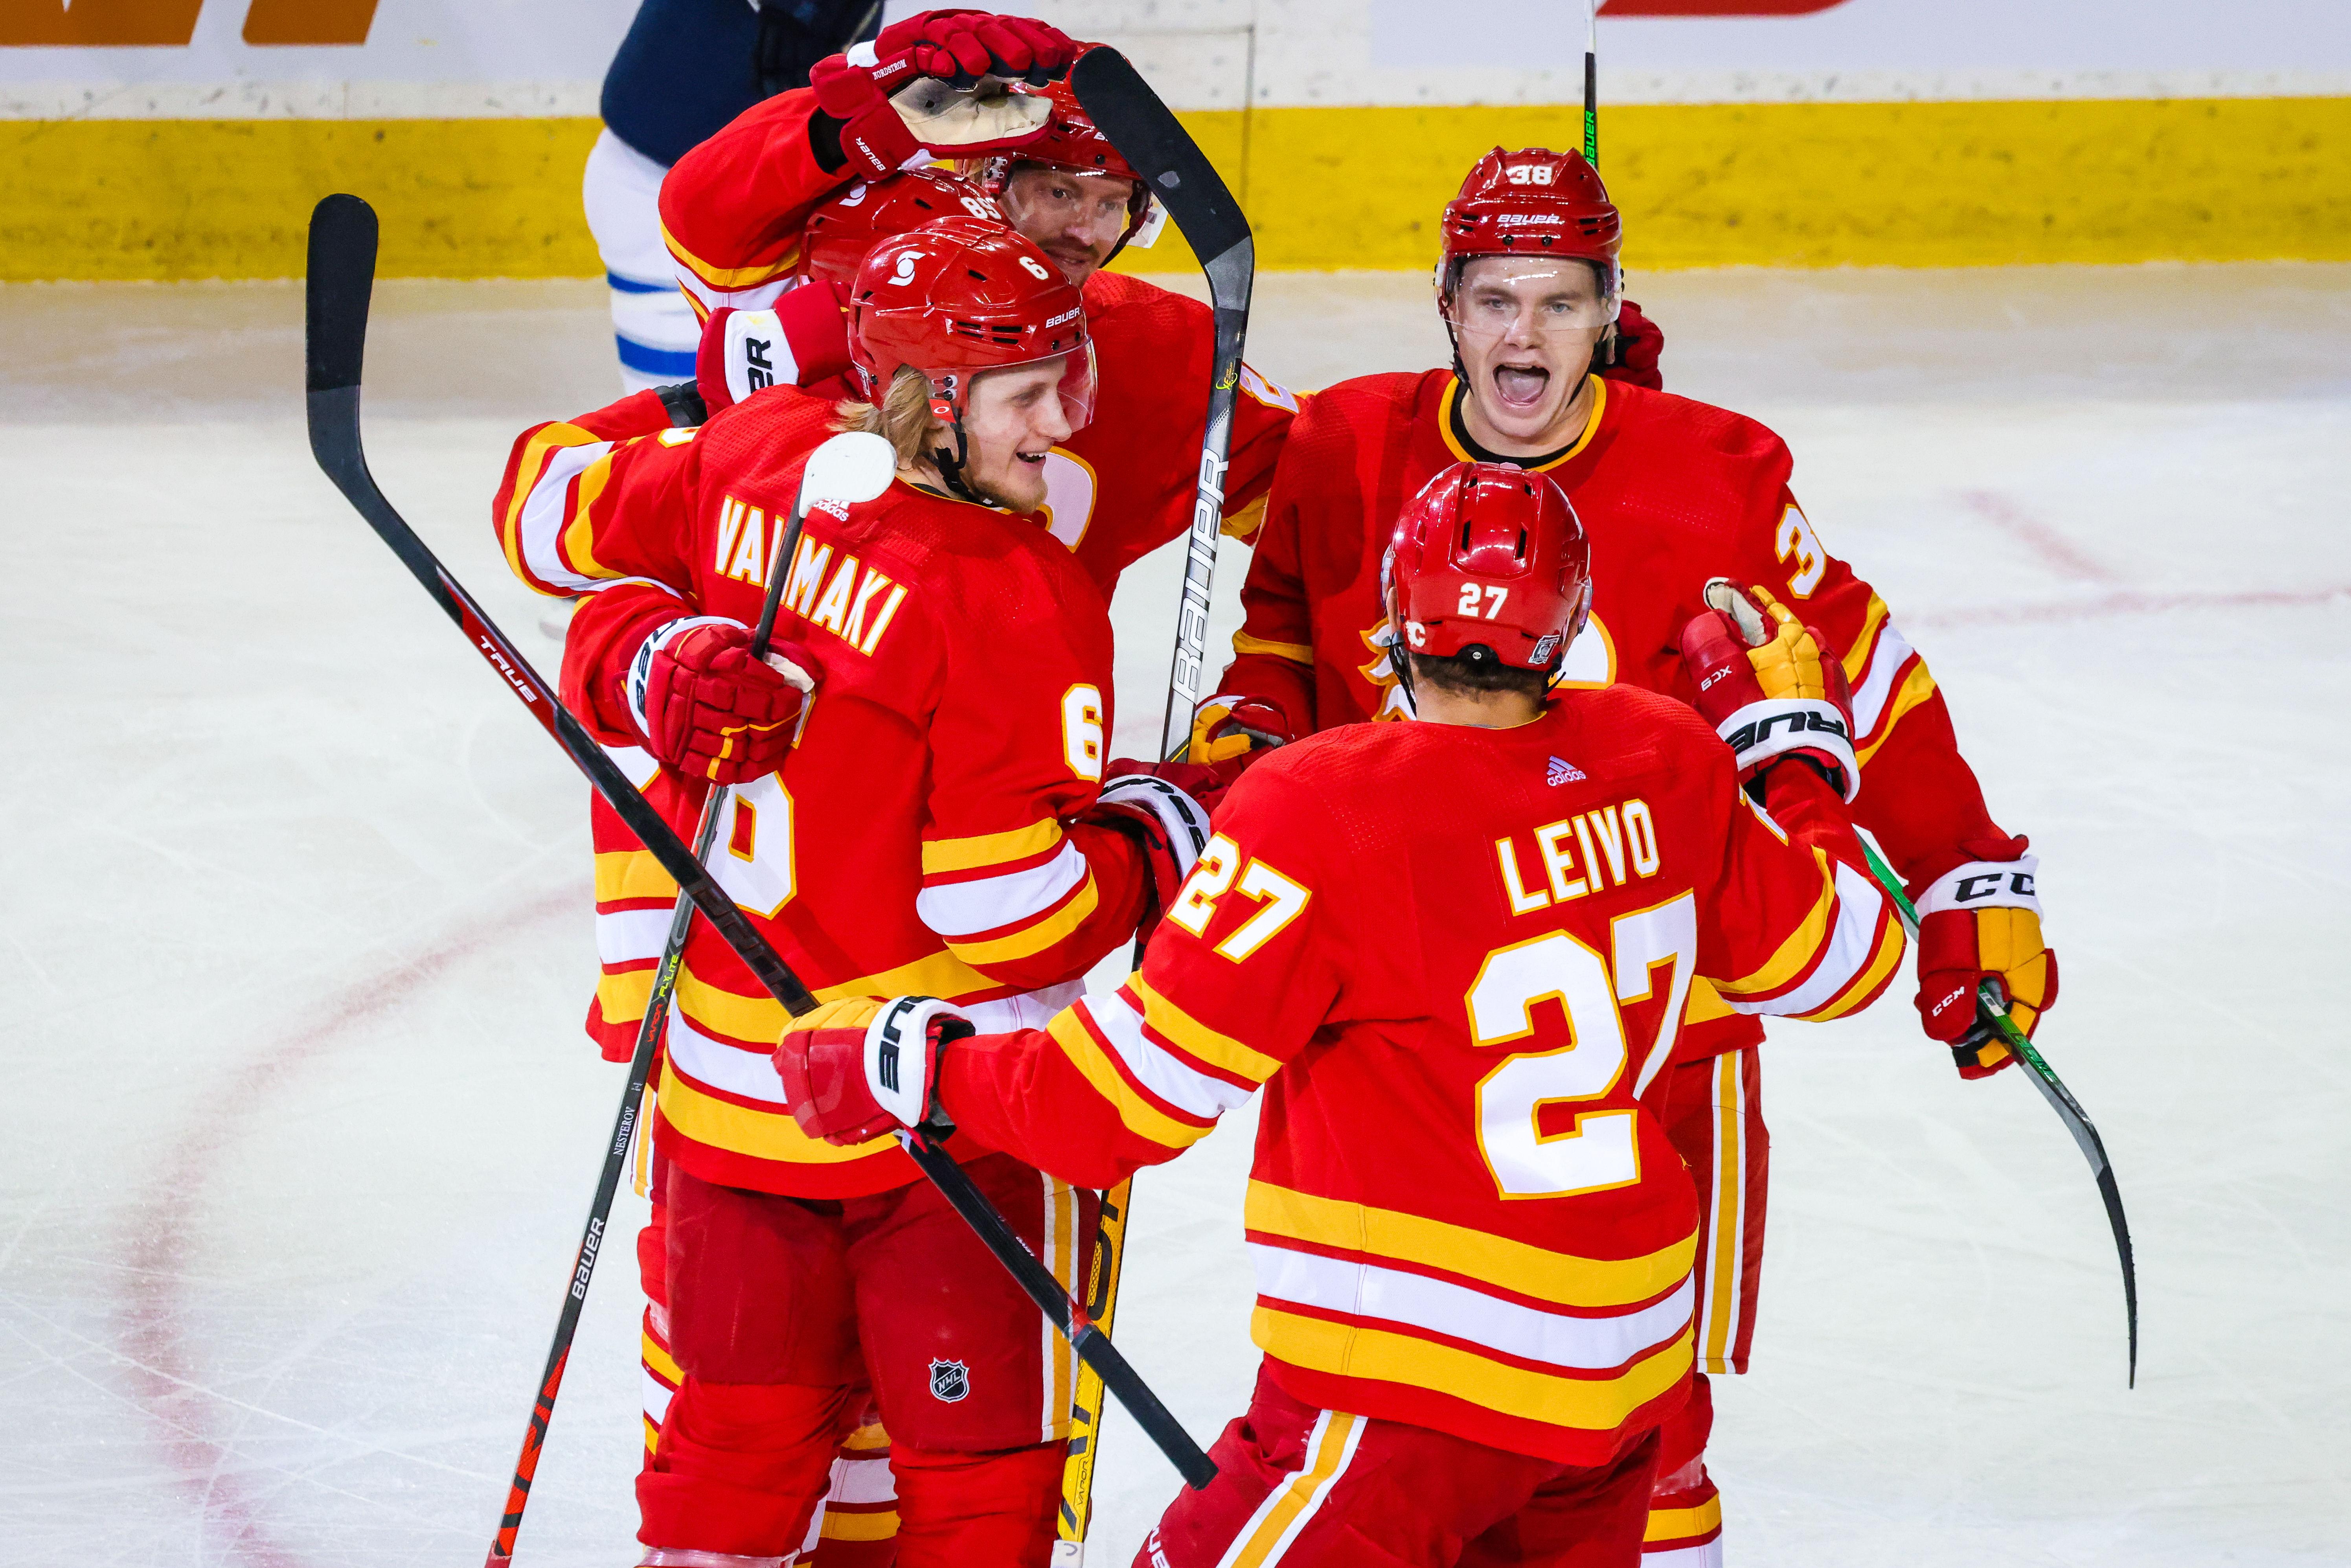 NHL: Winnipeg Jets at Calgary Flames